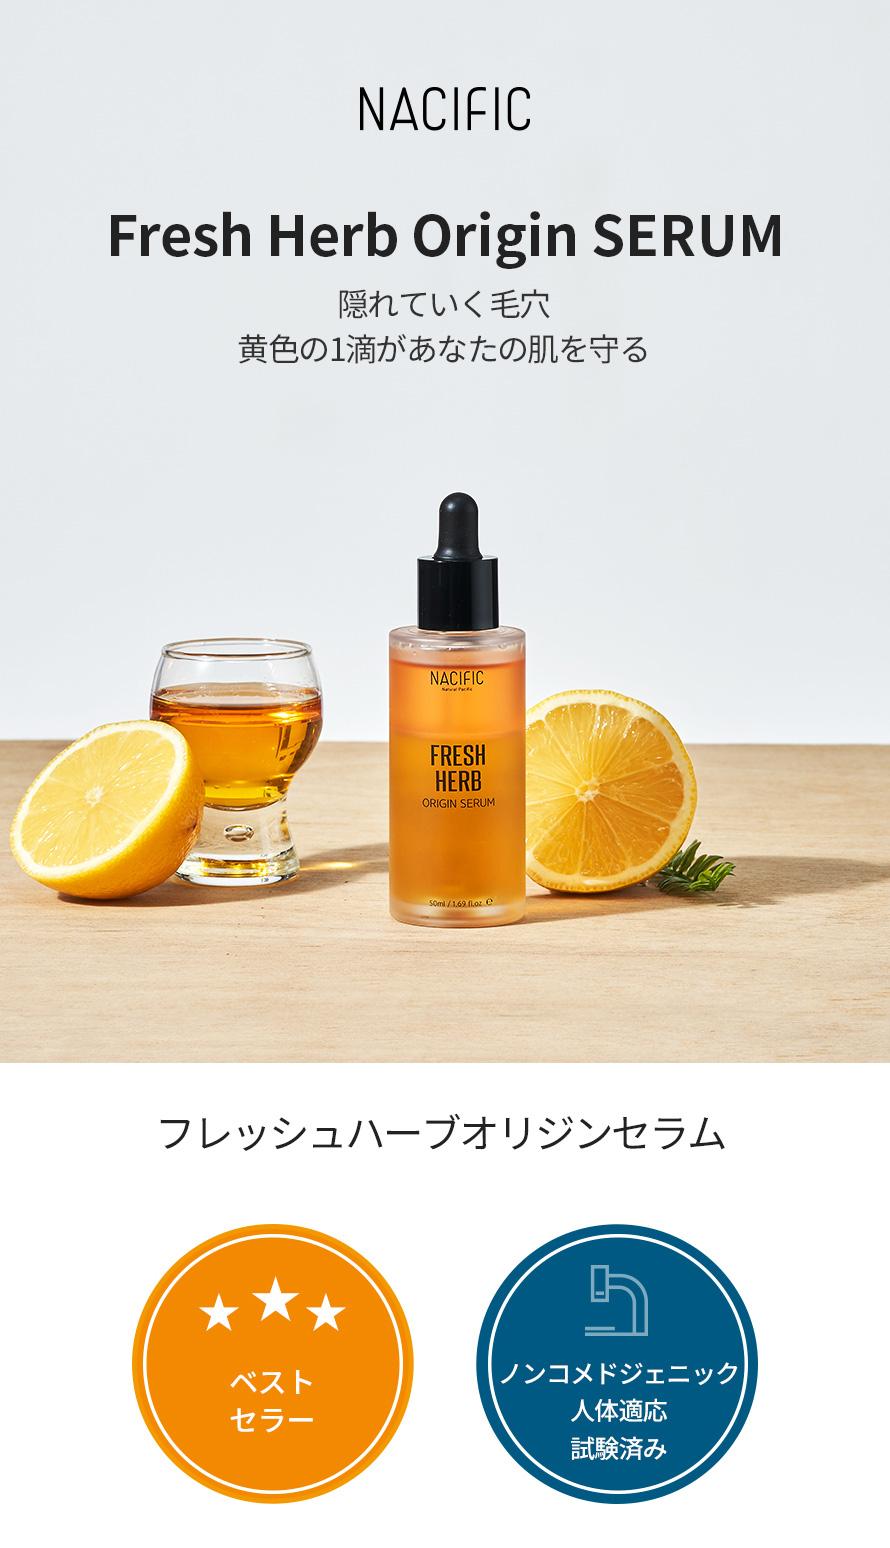 [NACIFIC]Fresh Herb Origin Serum フレッシュハーブオリジンセラム